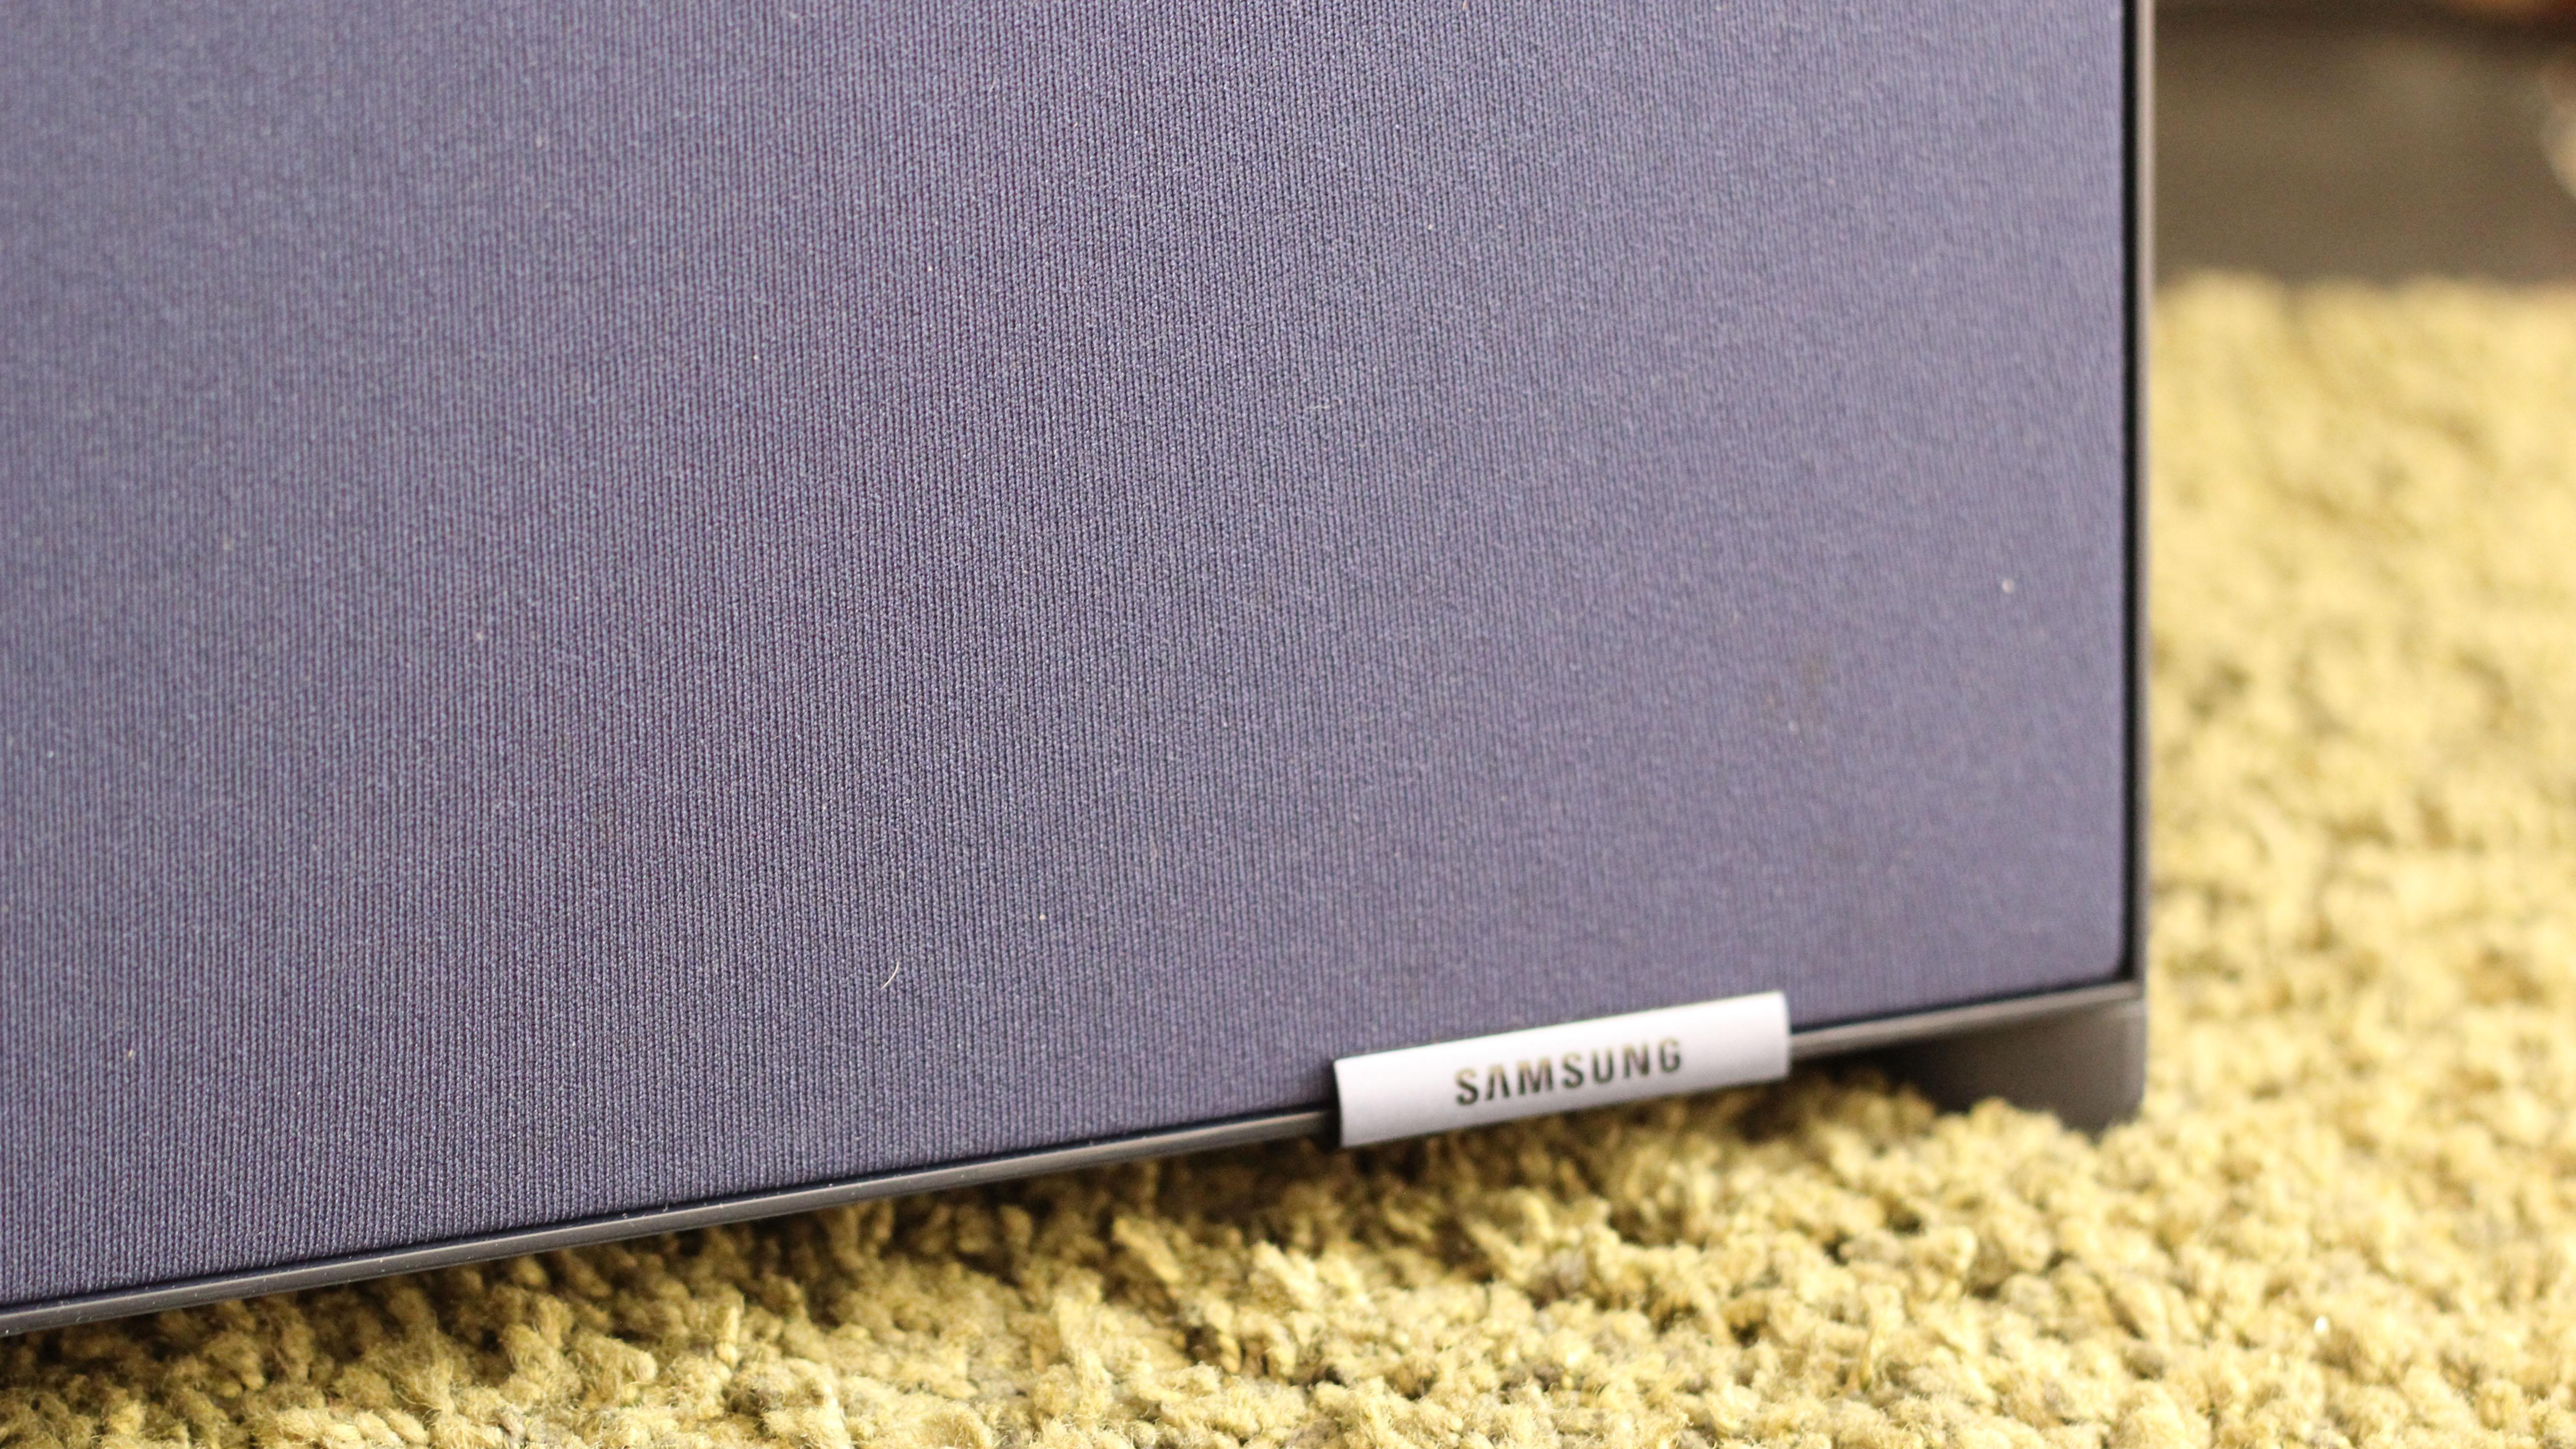 A close-up of the bottom of the Samsung Sero TV